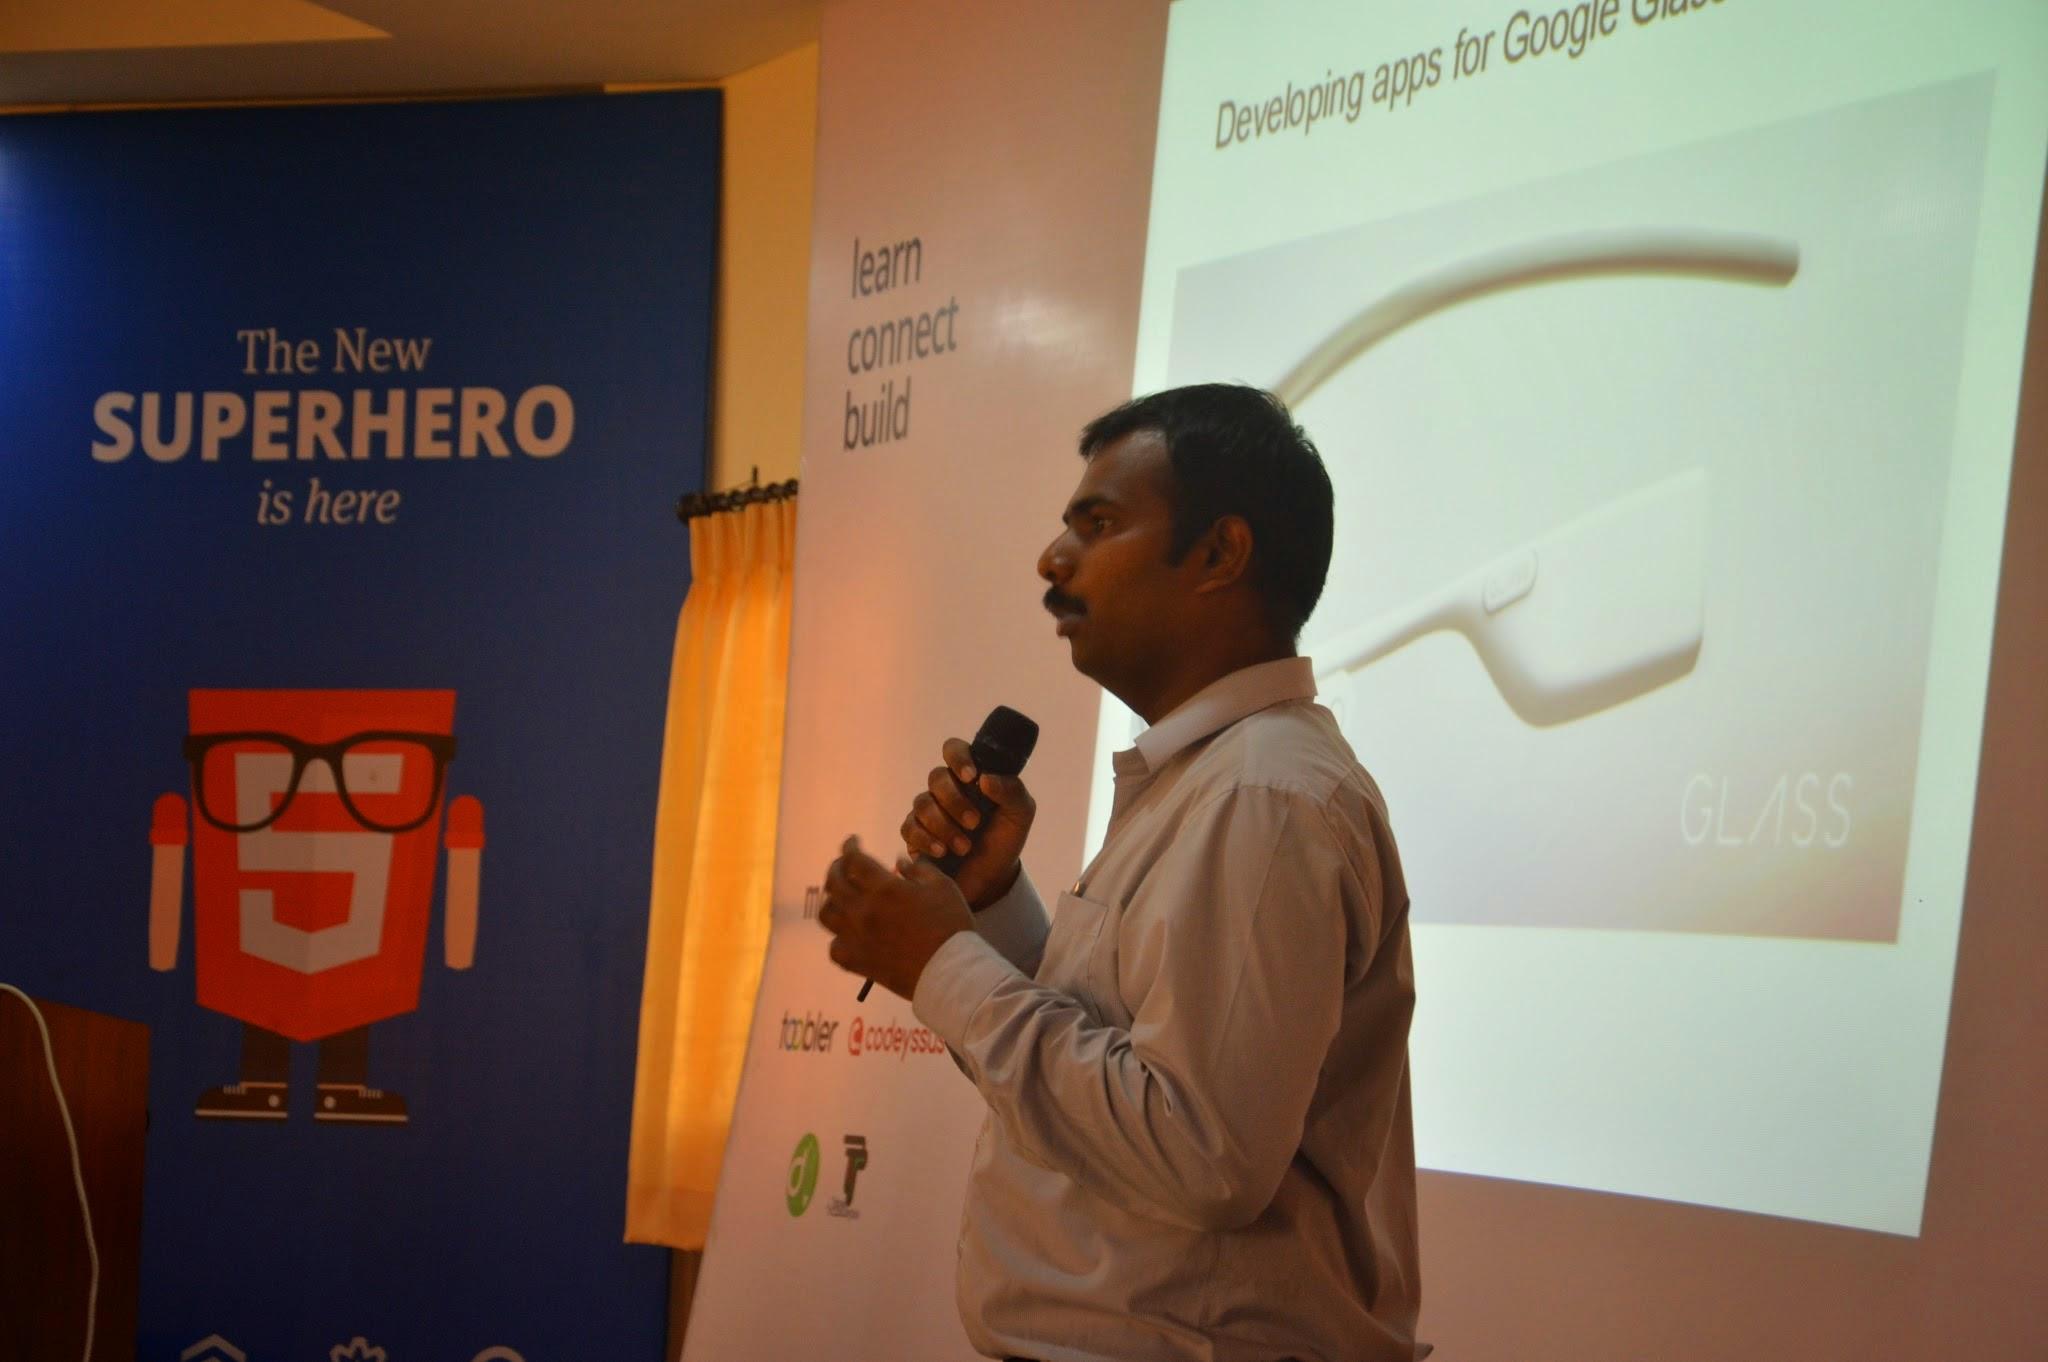 Prakash-GoogleGlass